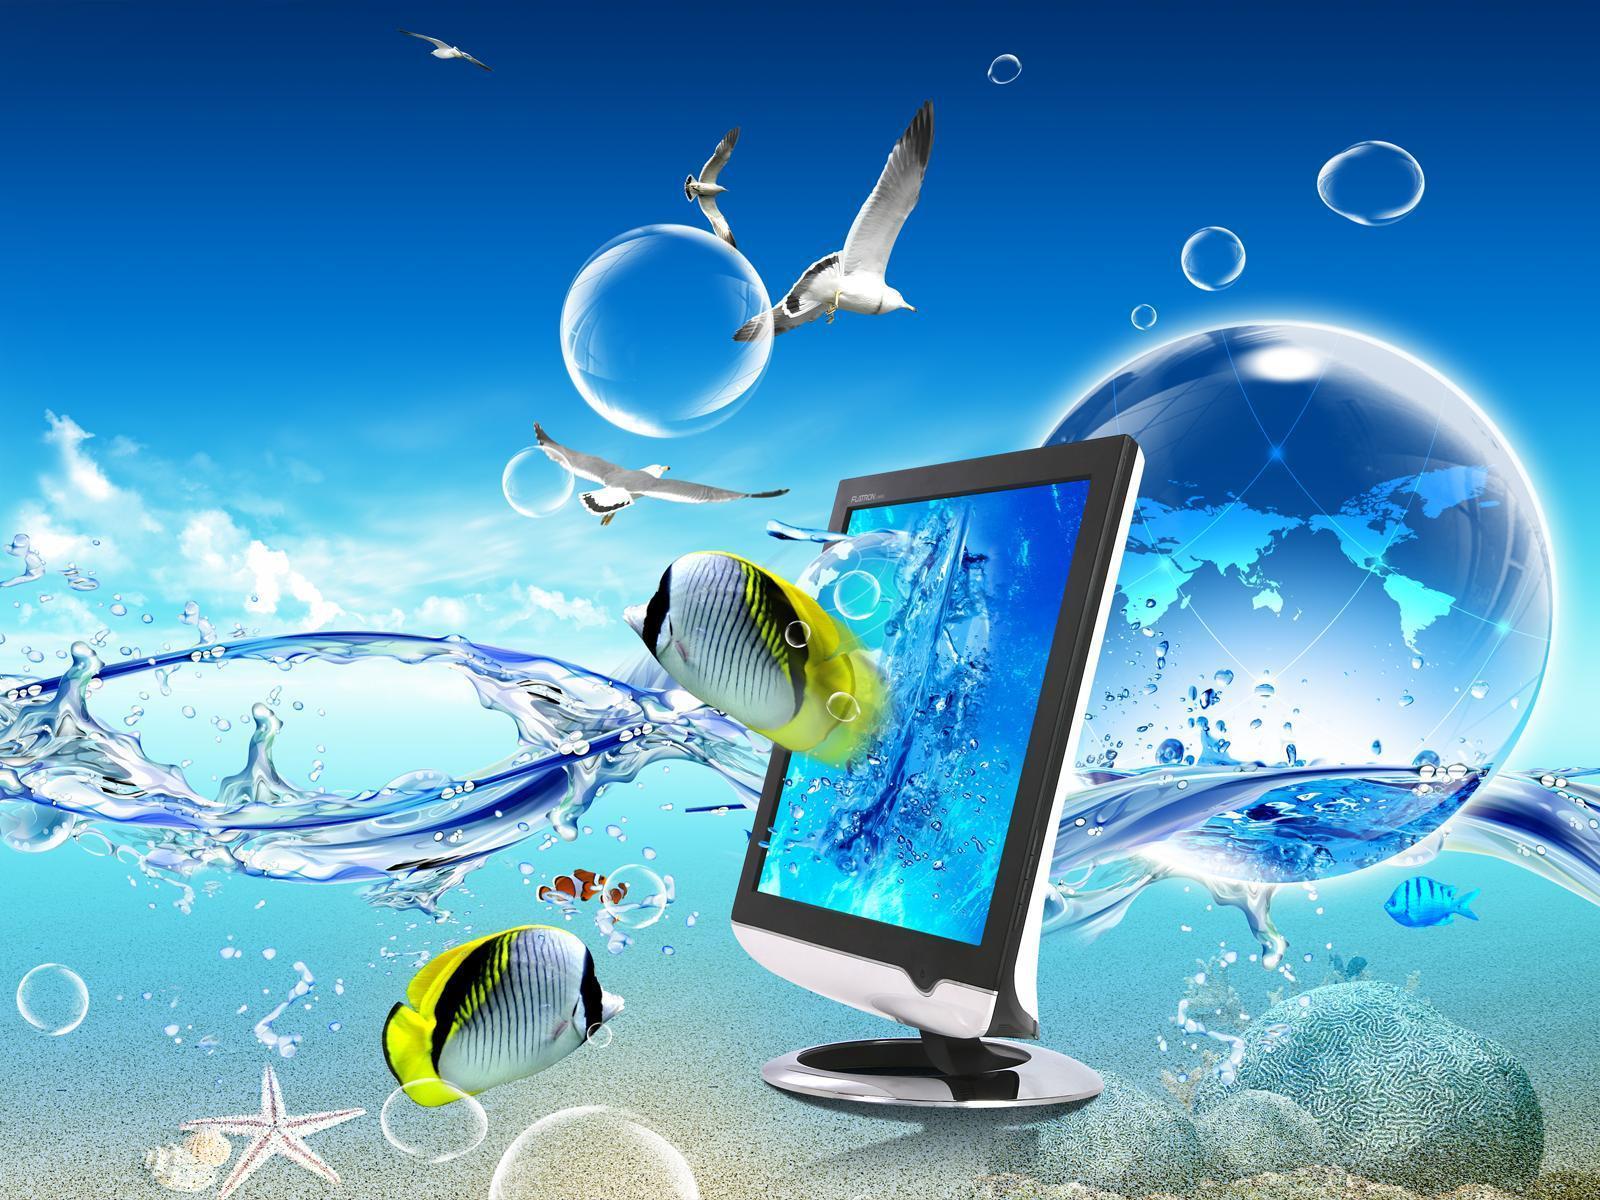 Desktop Wallpapers For PC Download Cool Wallpapers